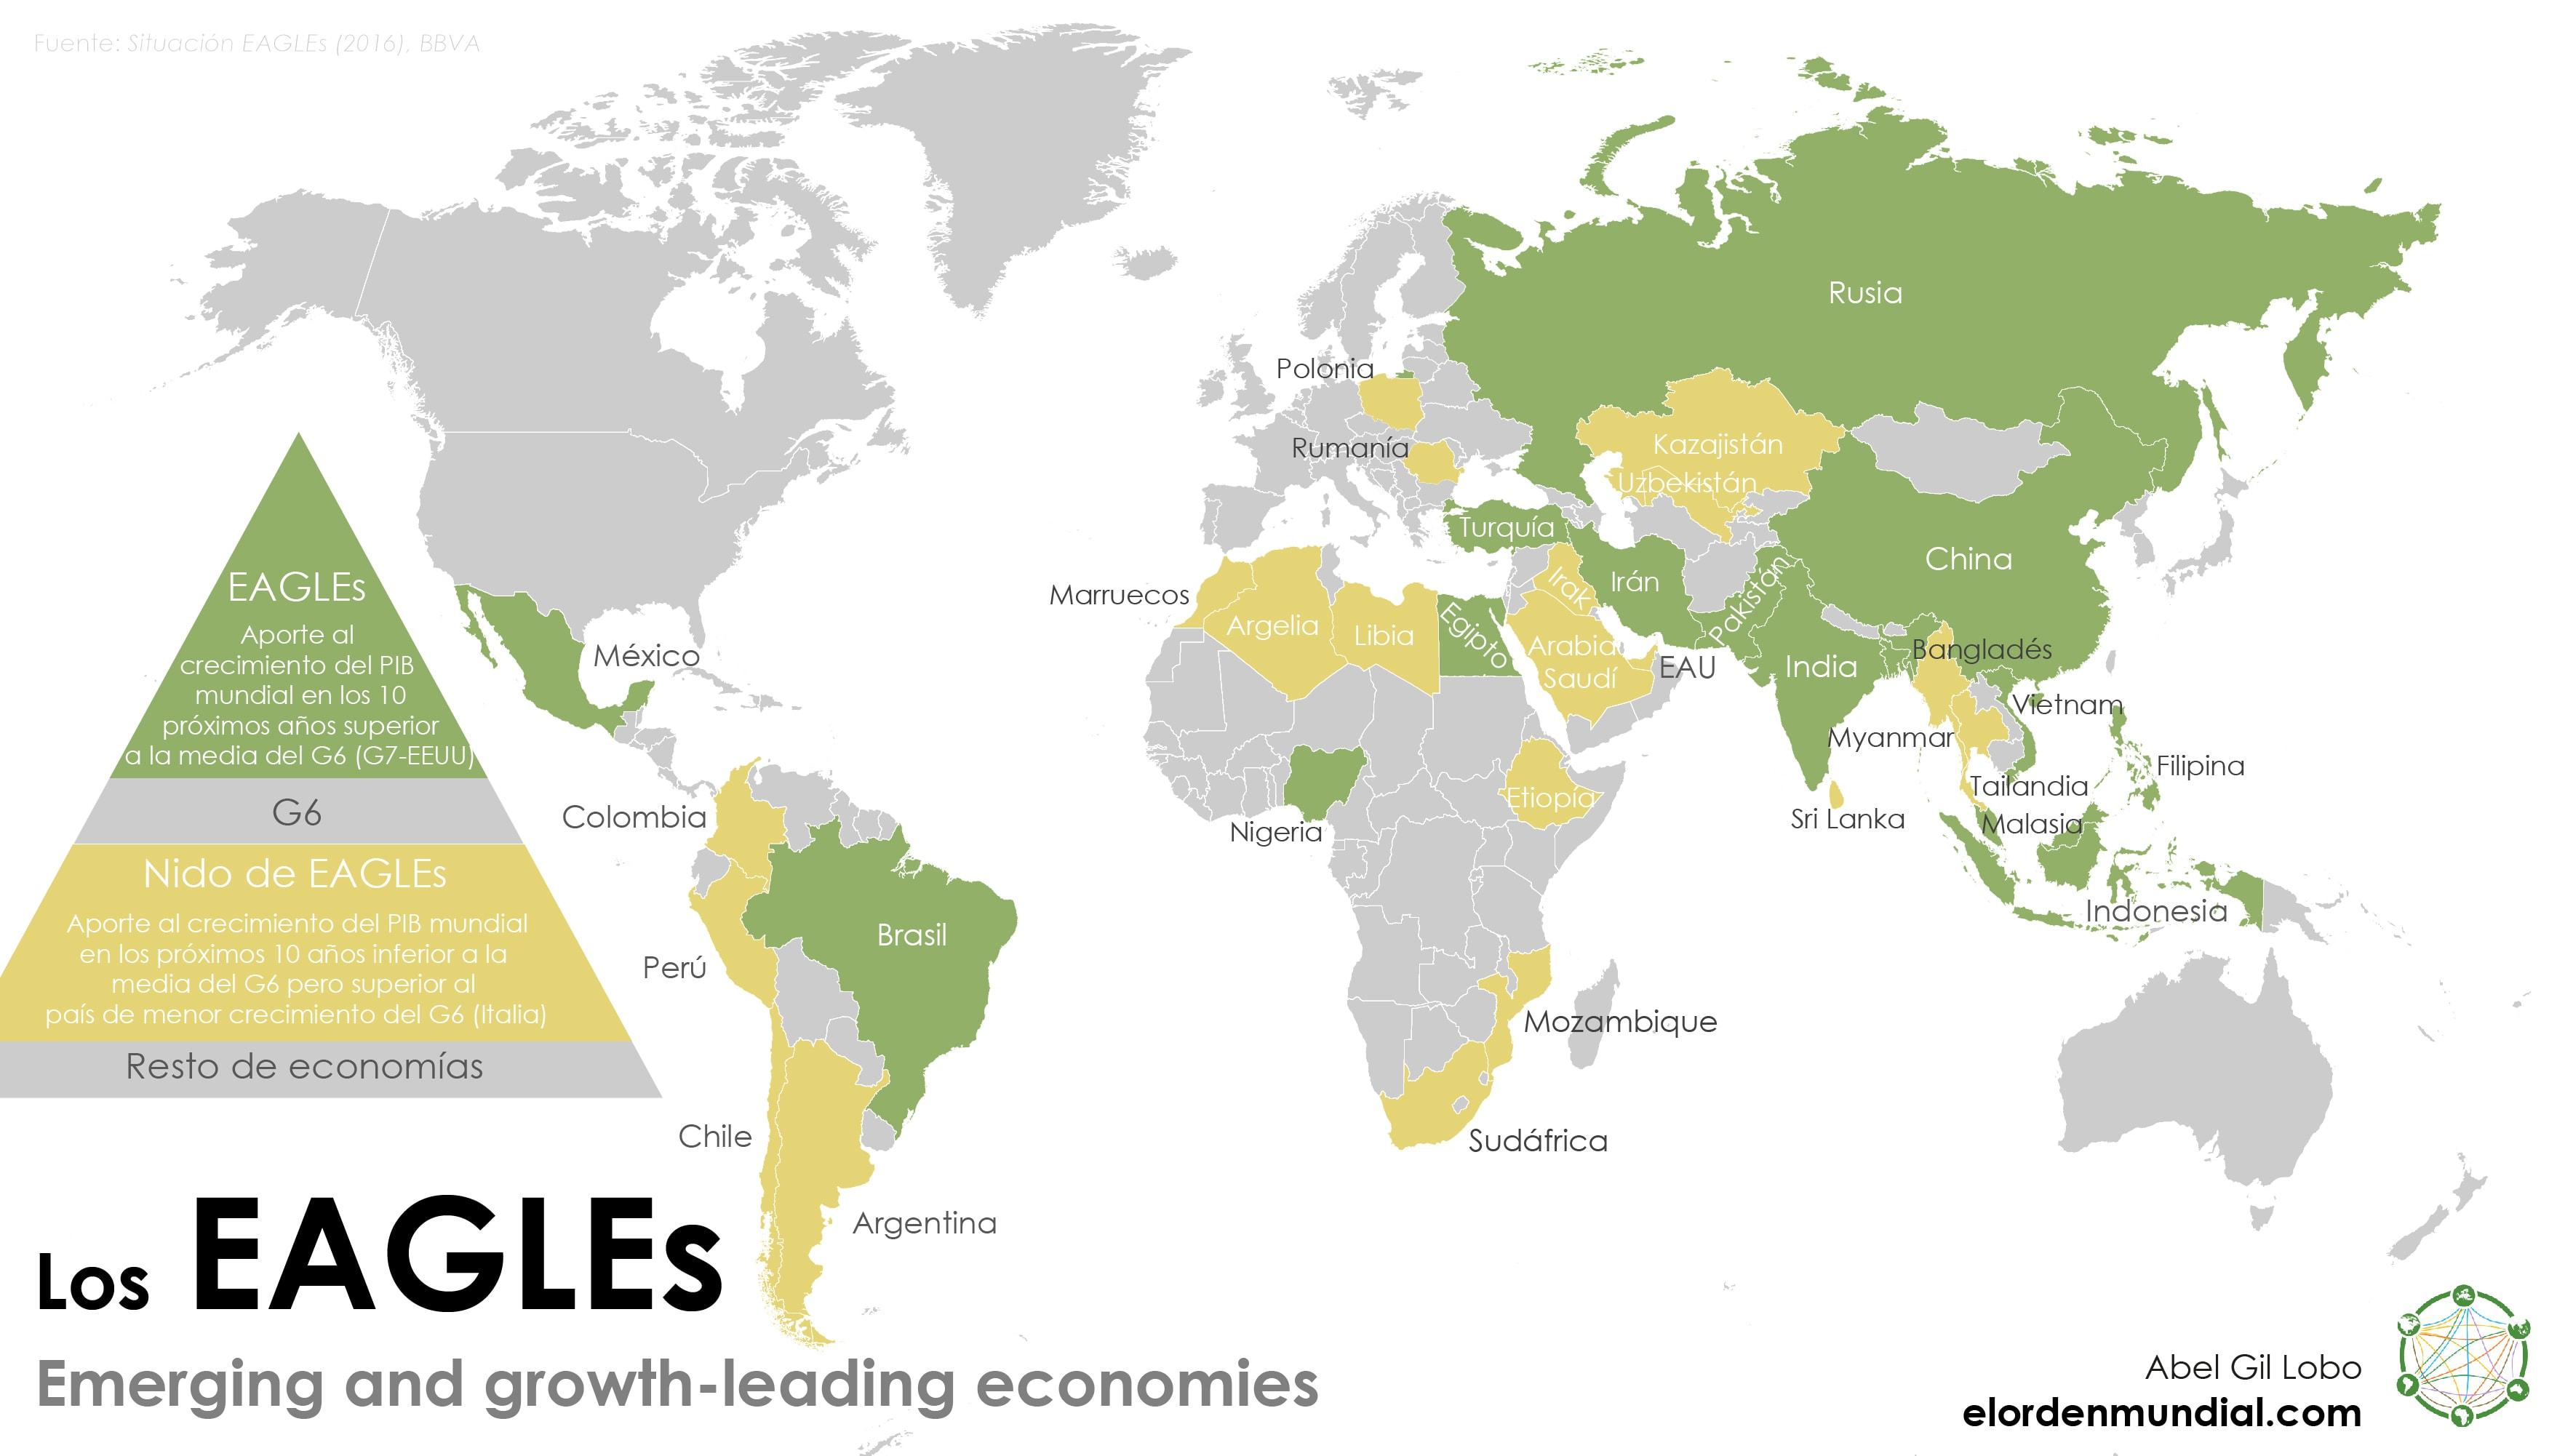 Mundo – Economía – EAGLES – Next – Emergentes – Mapa